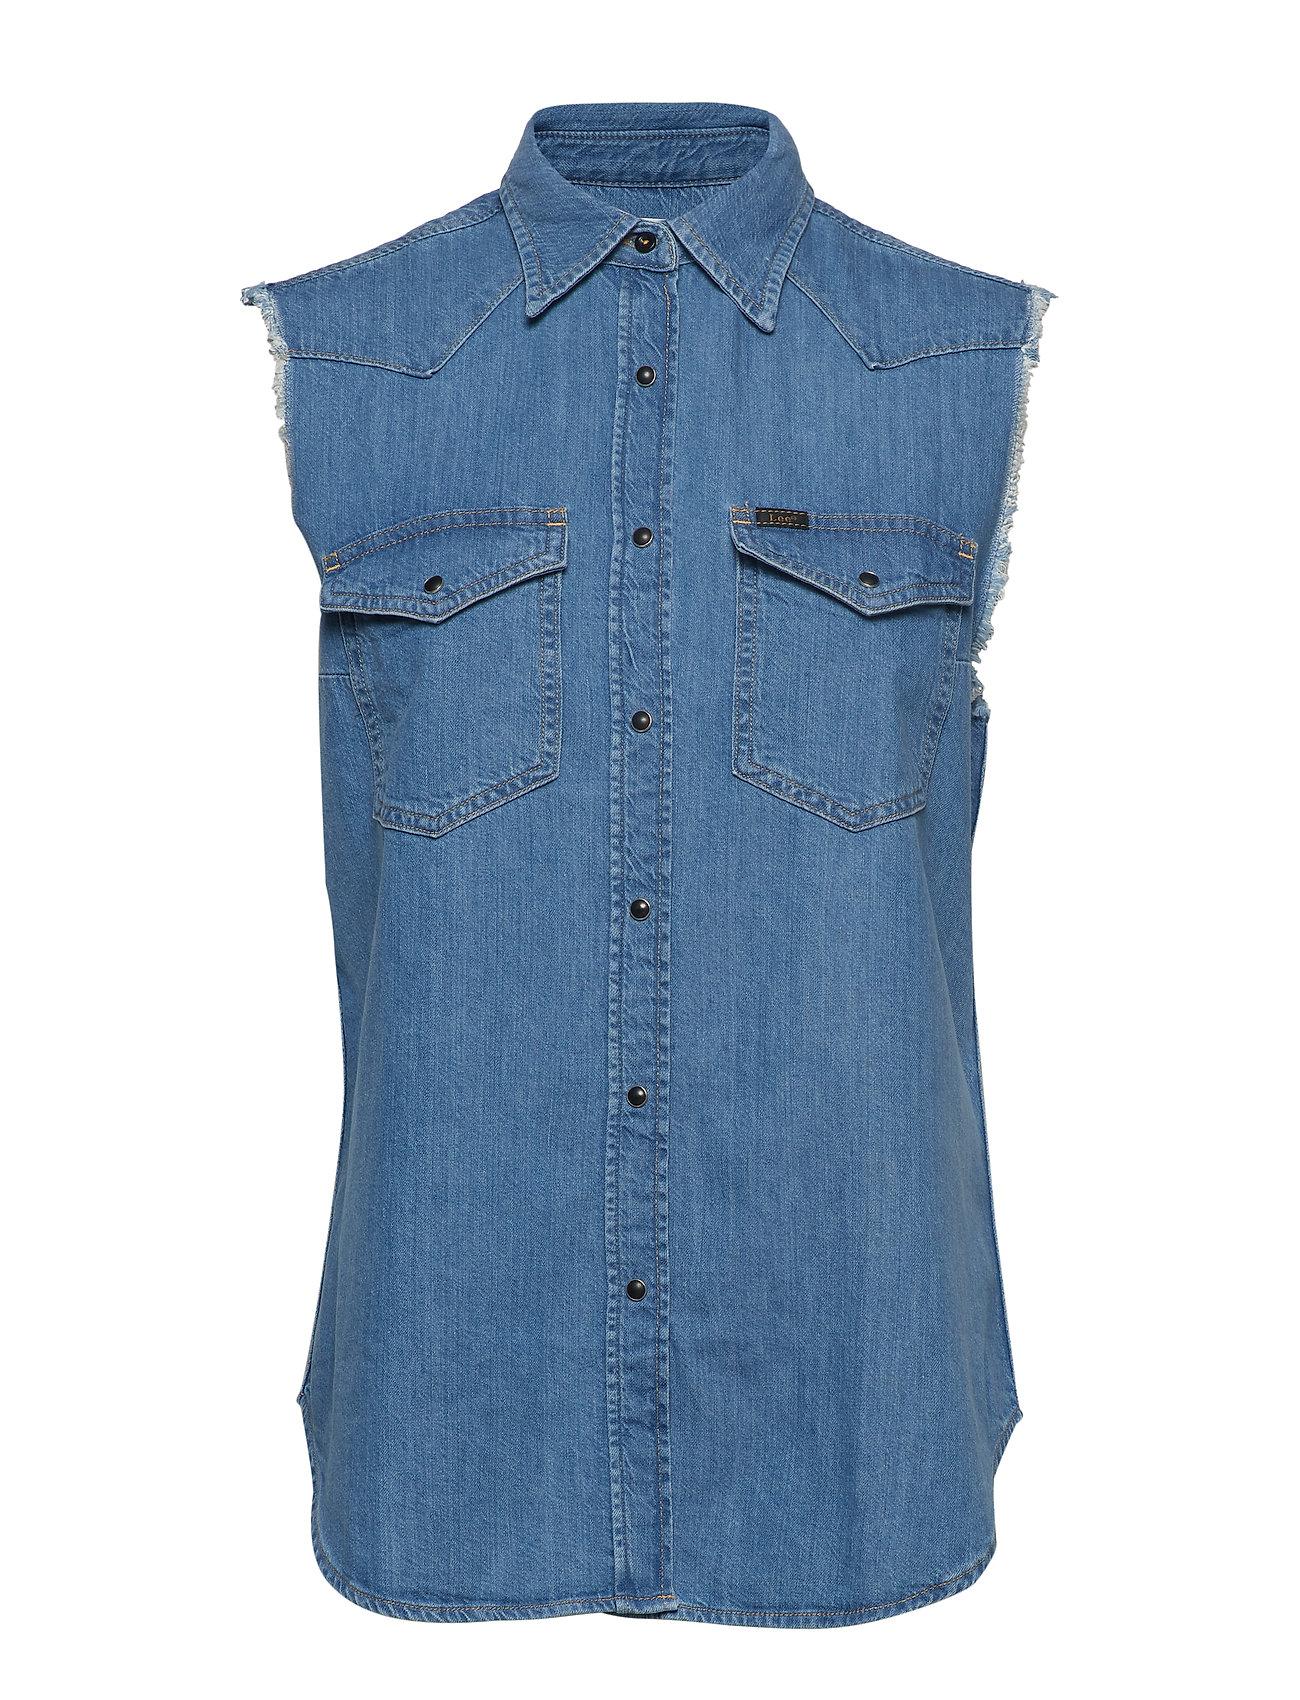 Lee Jeans CUT OFF WESTERN SHIR Ögrönlar